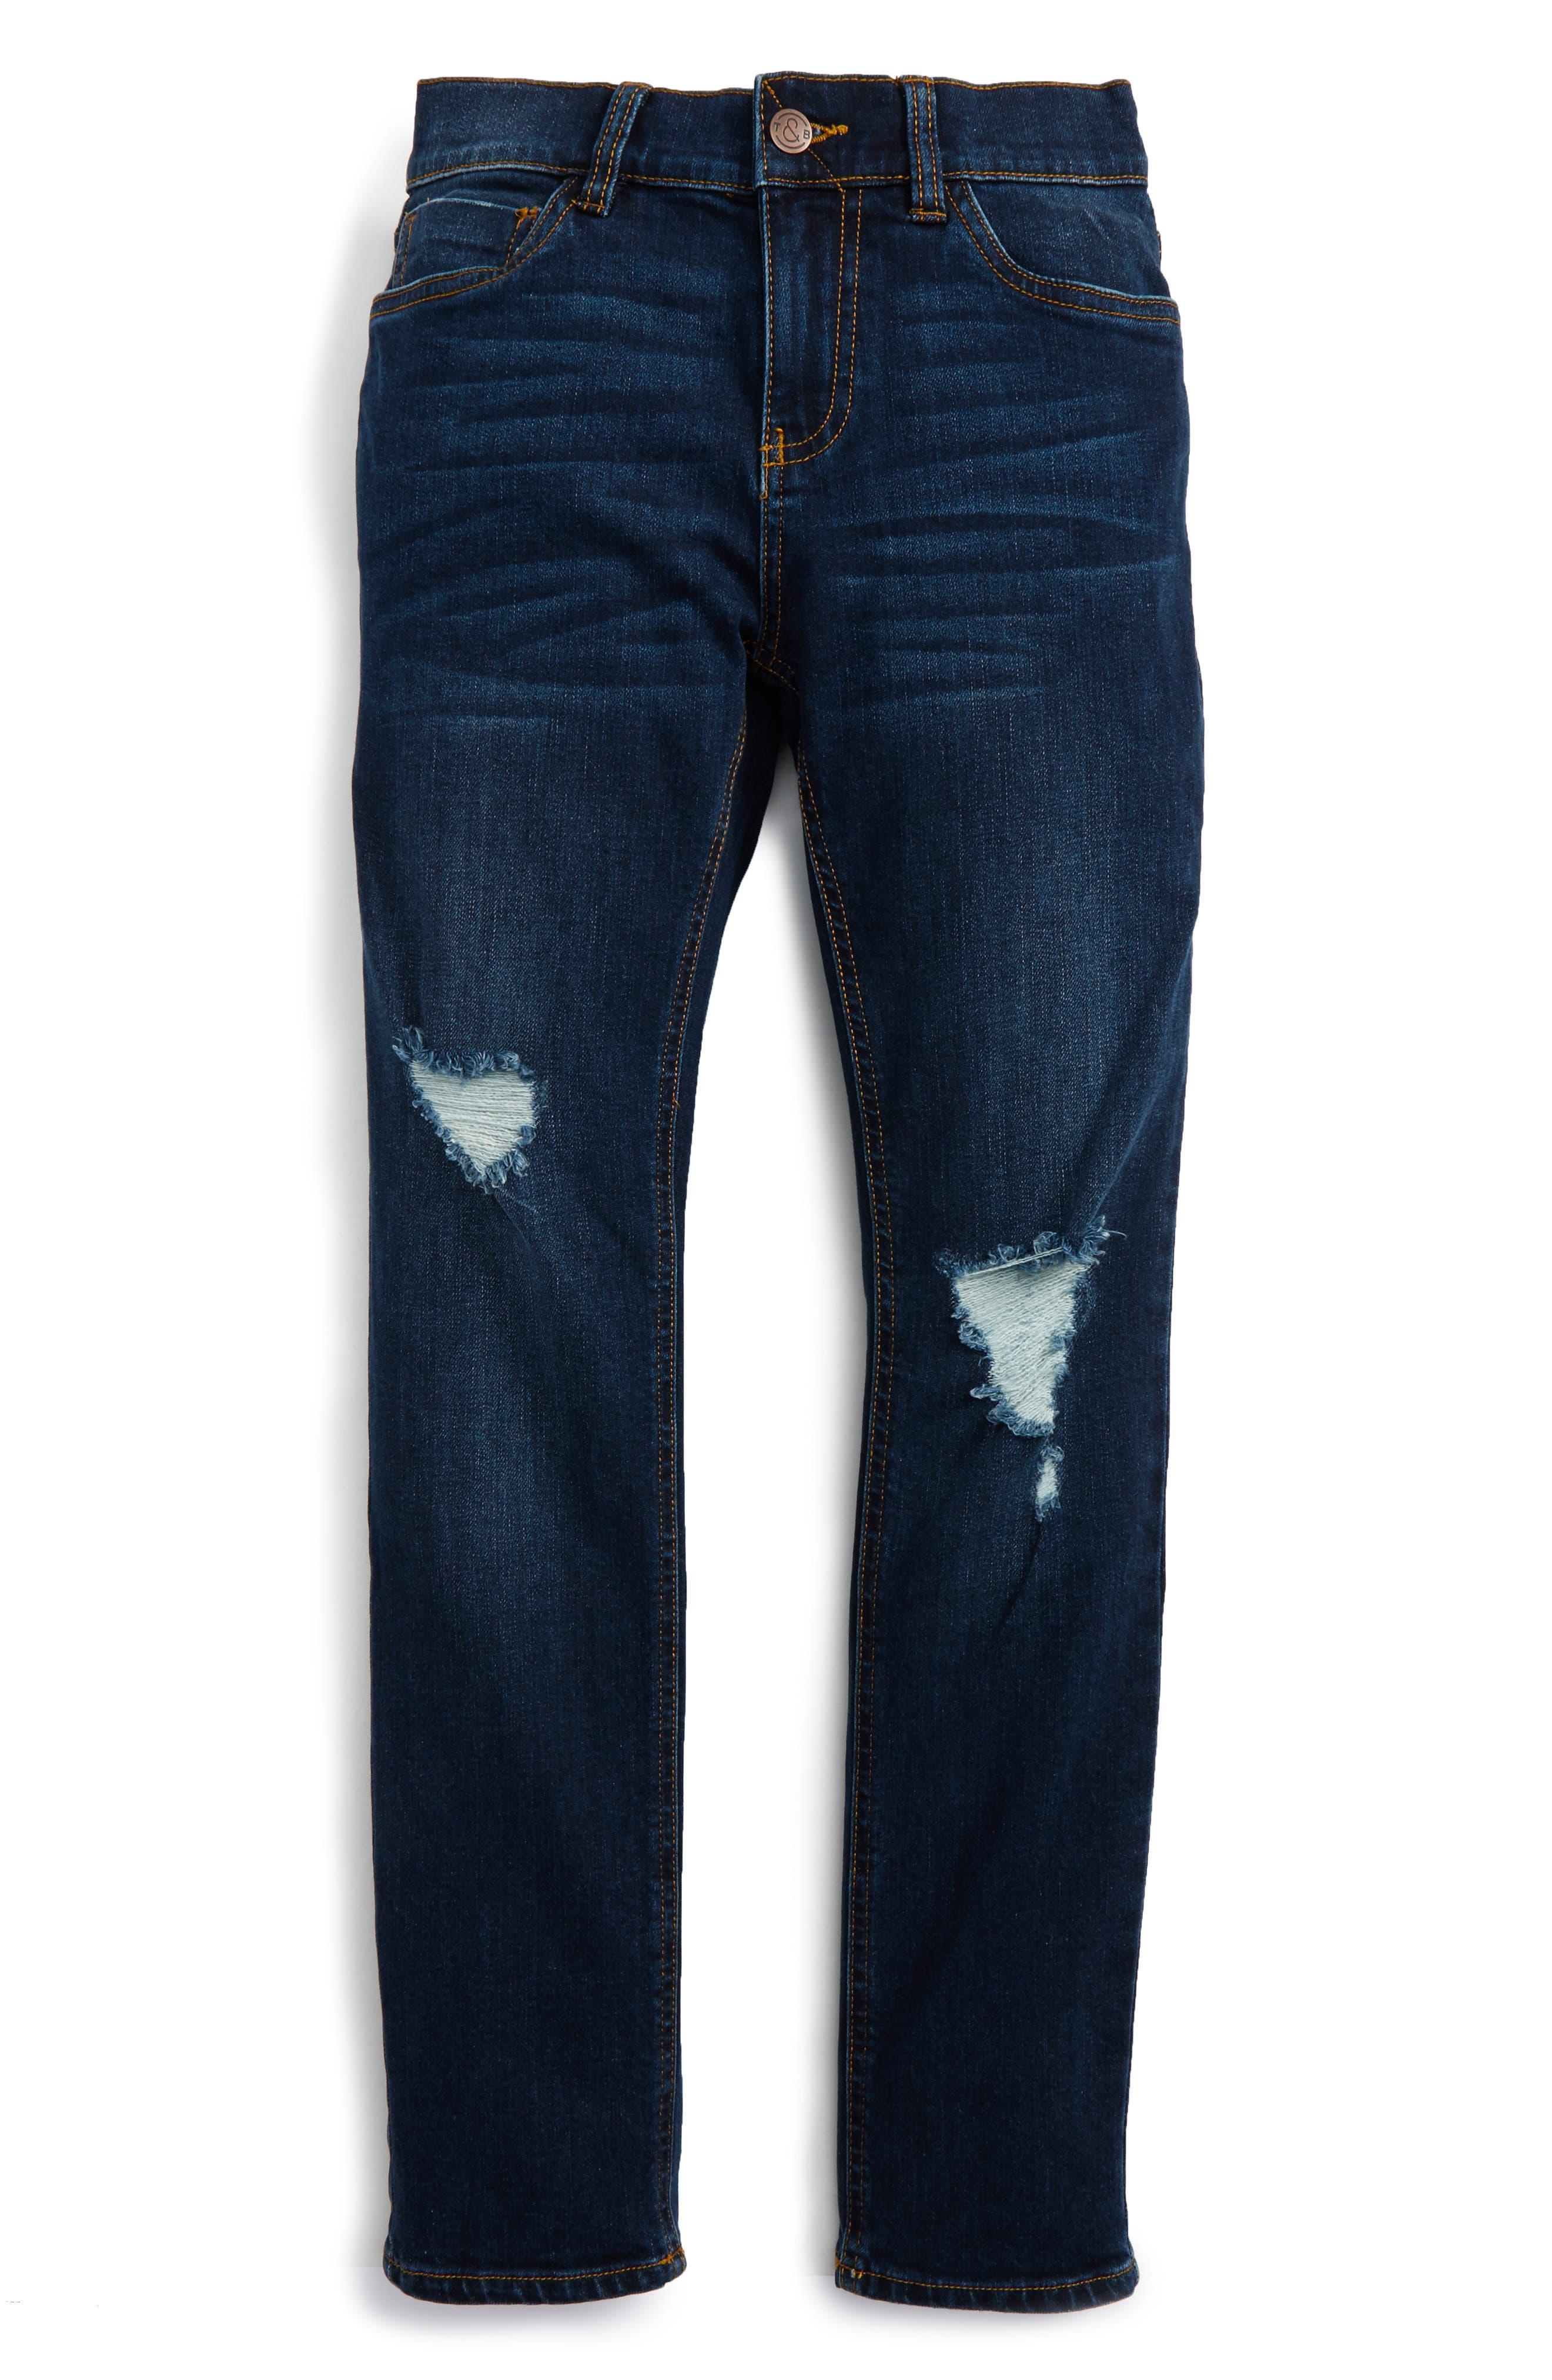 Treasure & Bond Distressed Skinny Jeans (Big Boys)